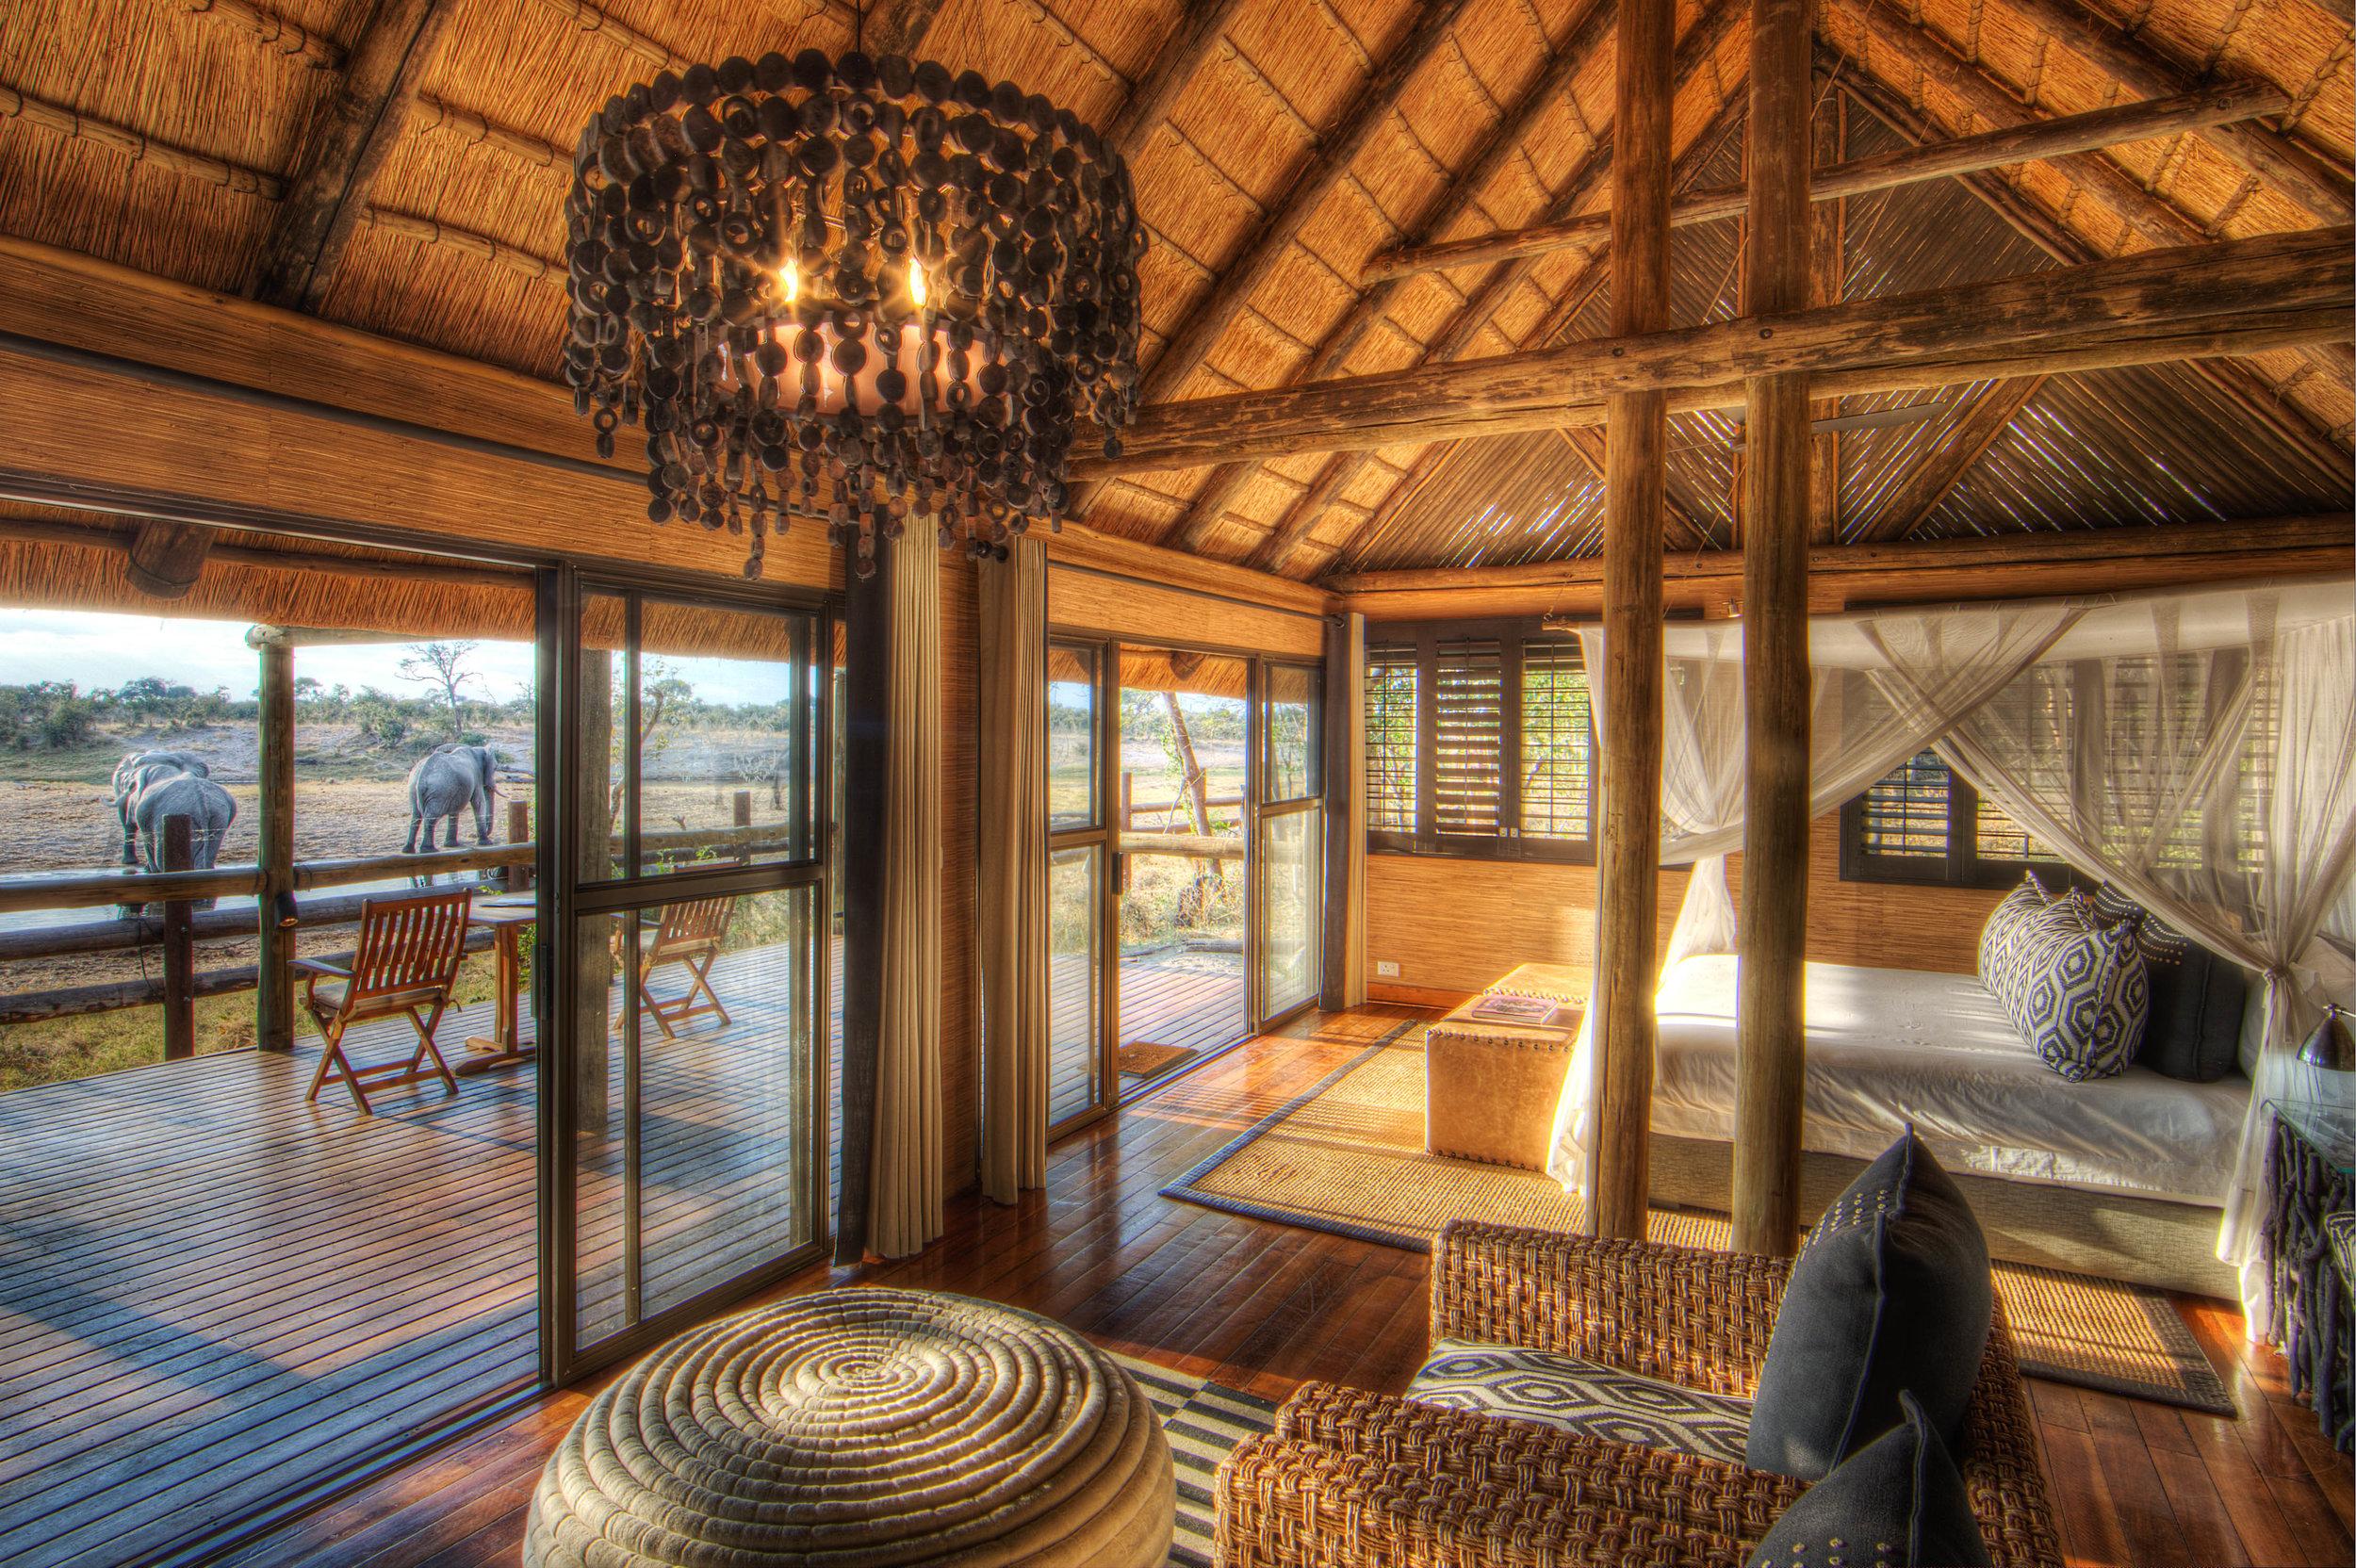 savute-safari-lodge-guest-room-interior.jpg